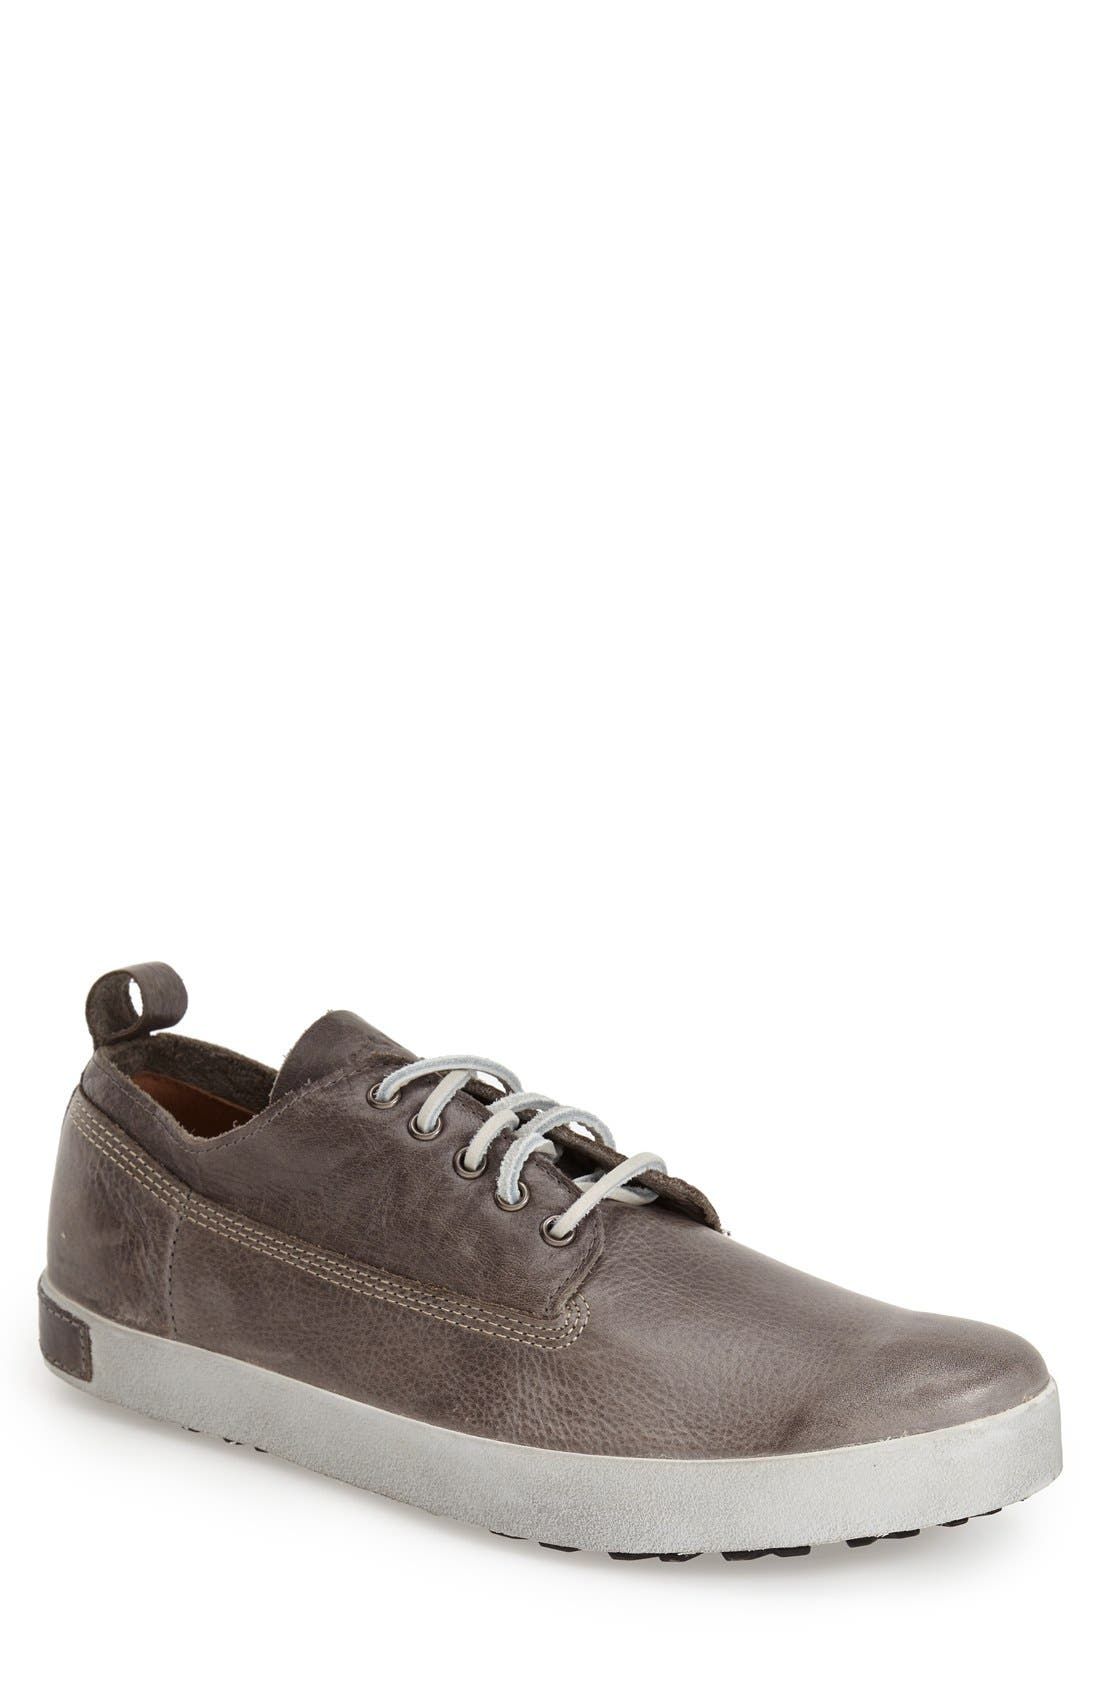 'JM 01' Sneaker,                         Main,                         color, 081